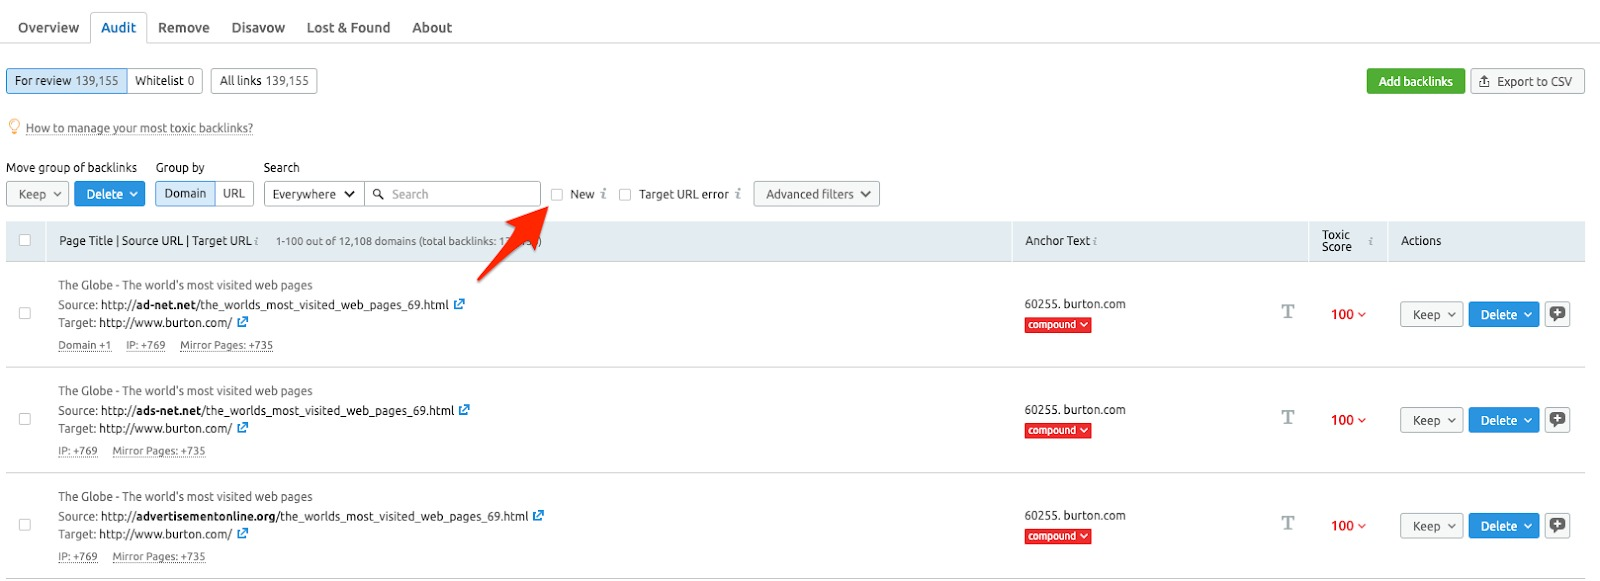 Cómo auditar tus backlinks image 2